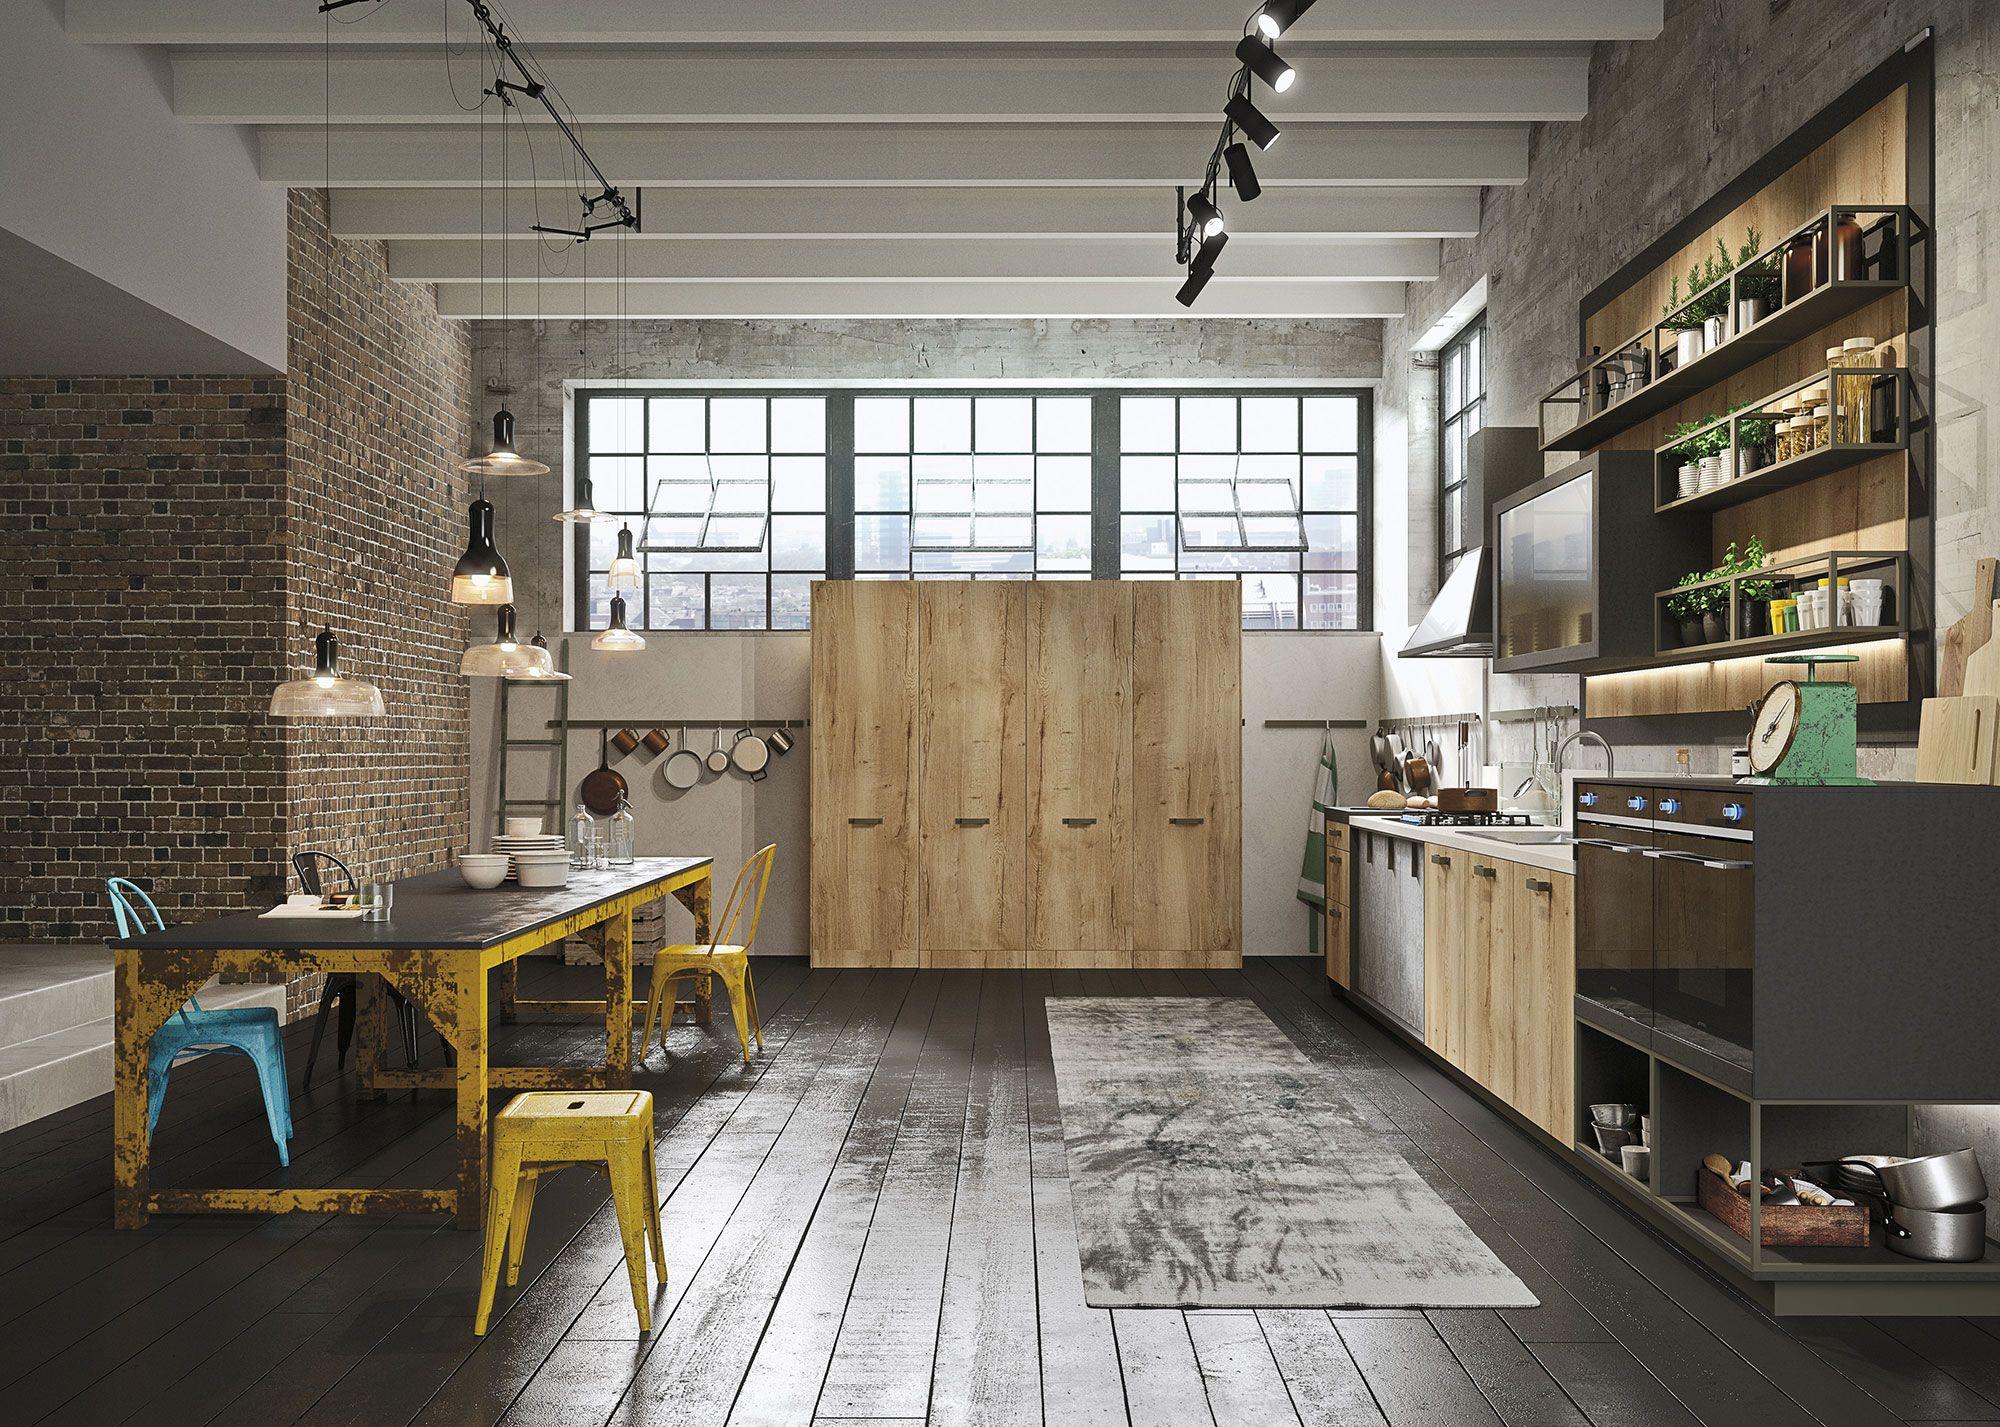 Industrial Kitchen Loft Loft Kitchen Industrial Style Kitchen Loft Style